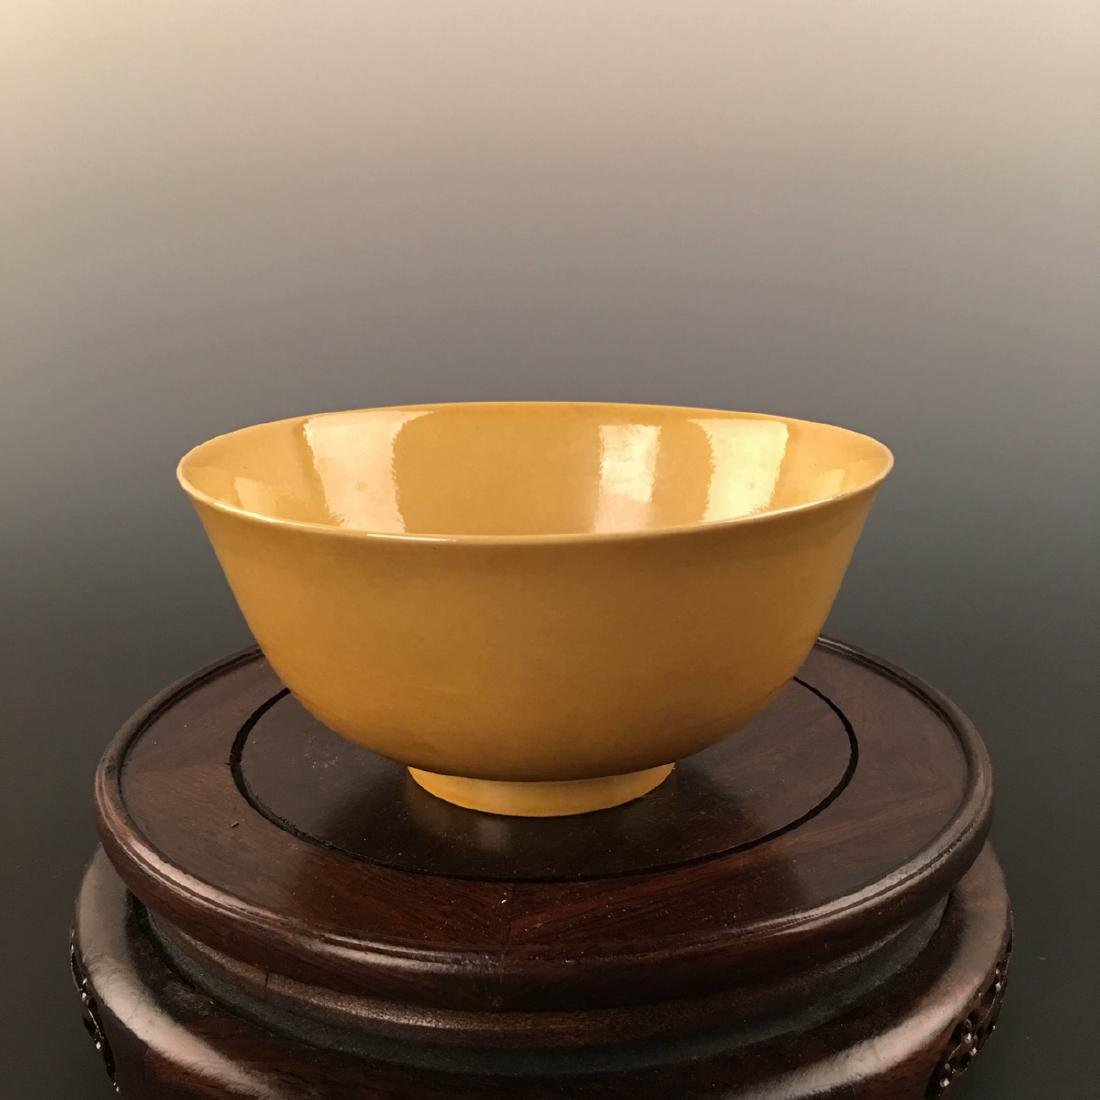 Chinese Yellow Glazed Ceramic Bowl With Hongzhi's Mark - 3